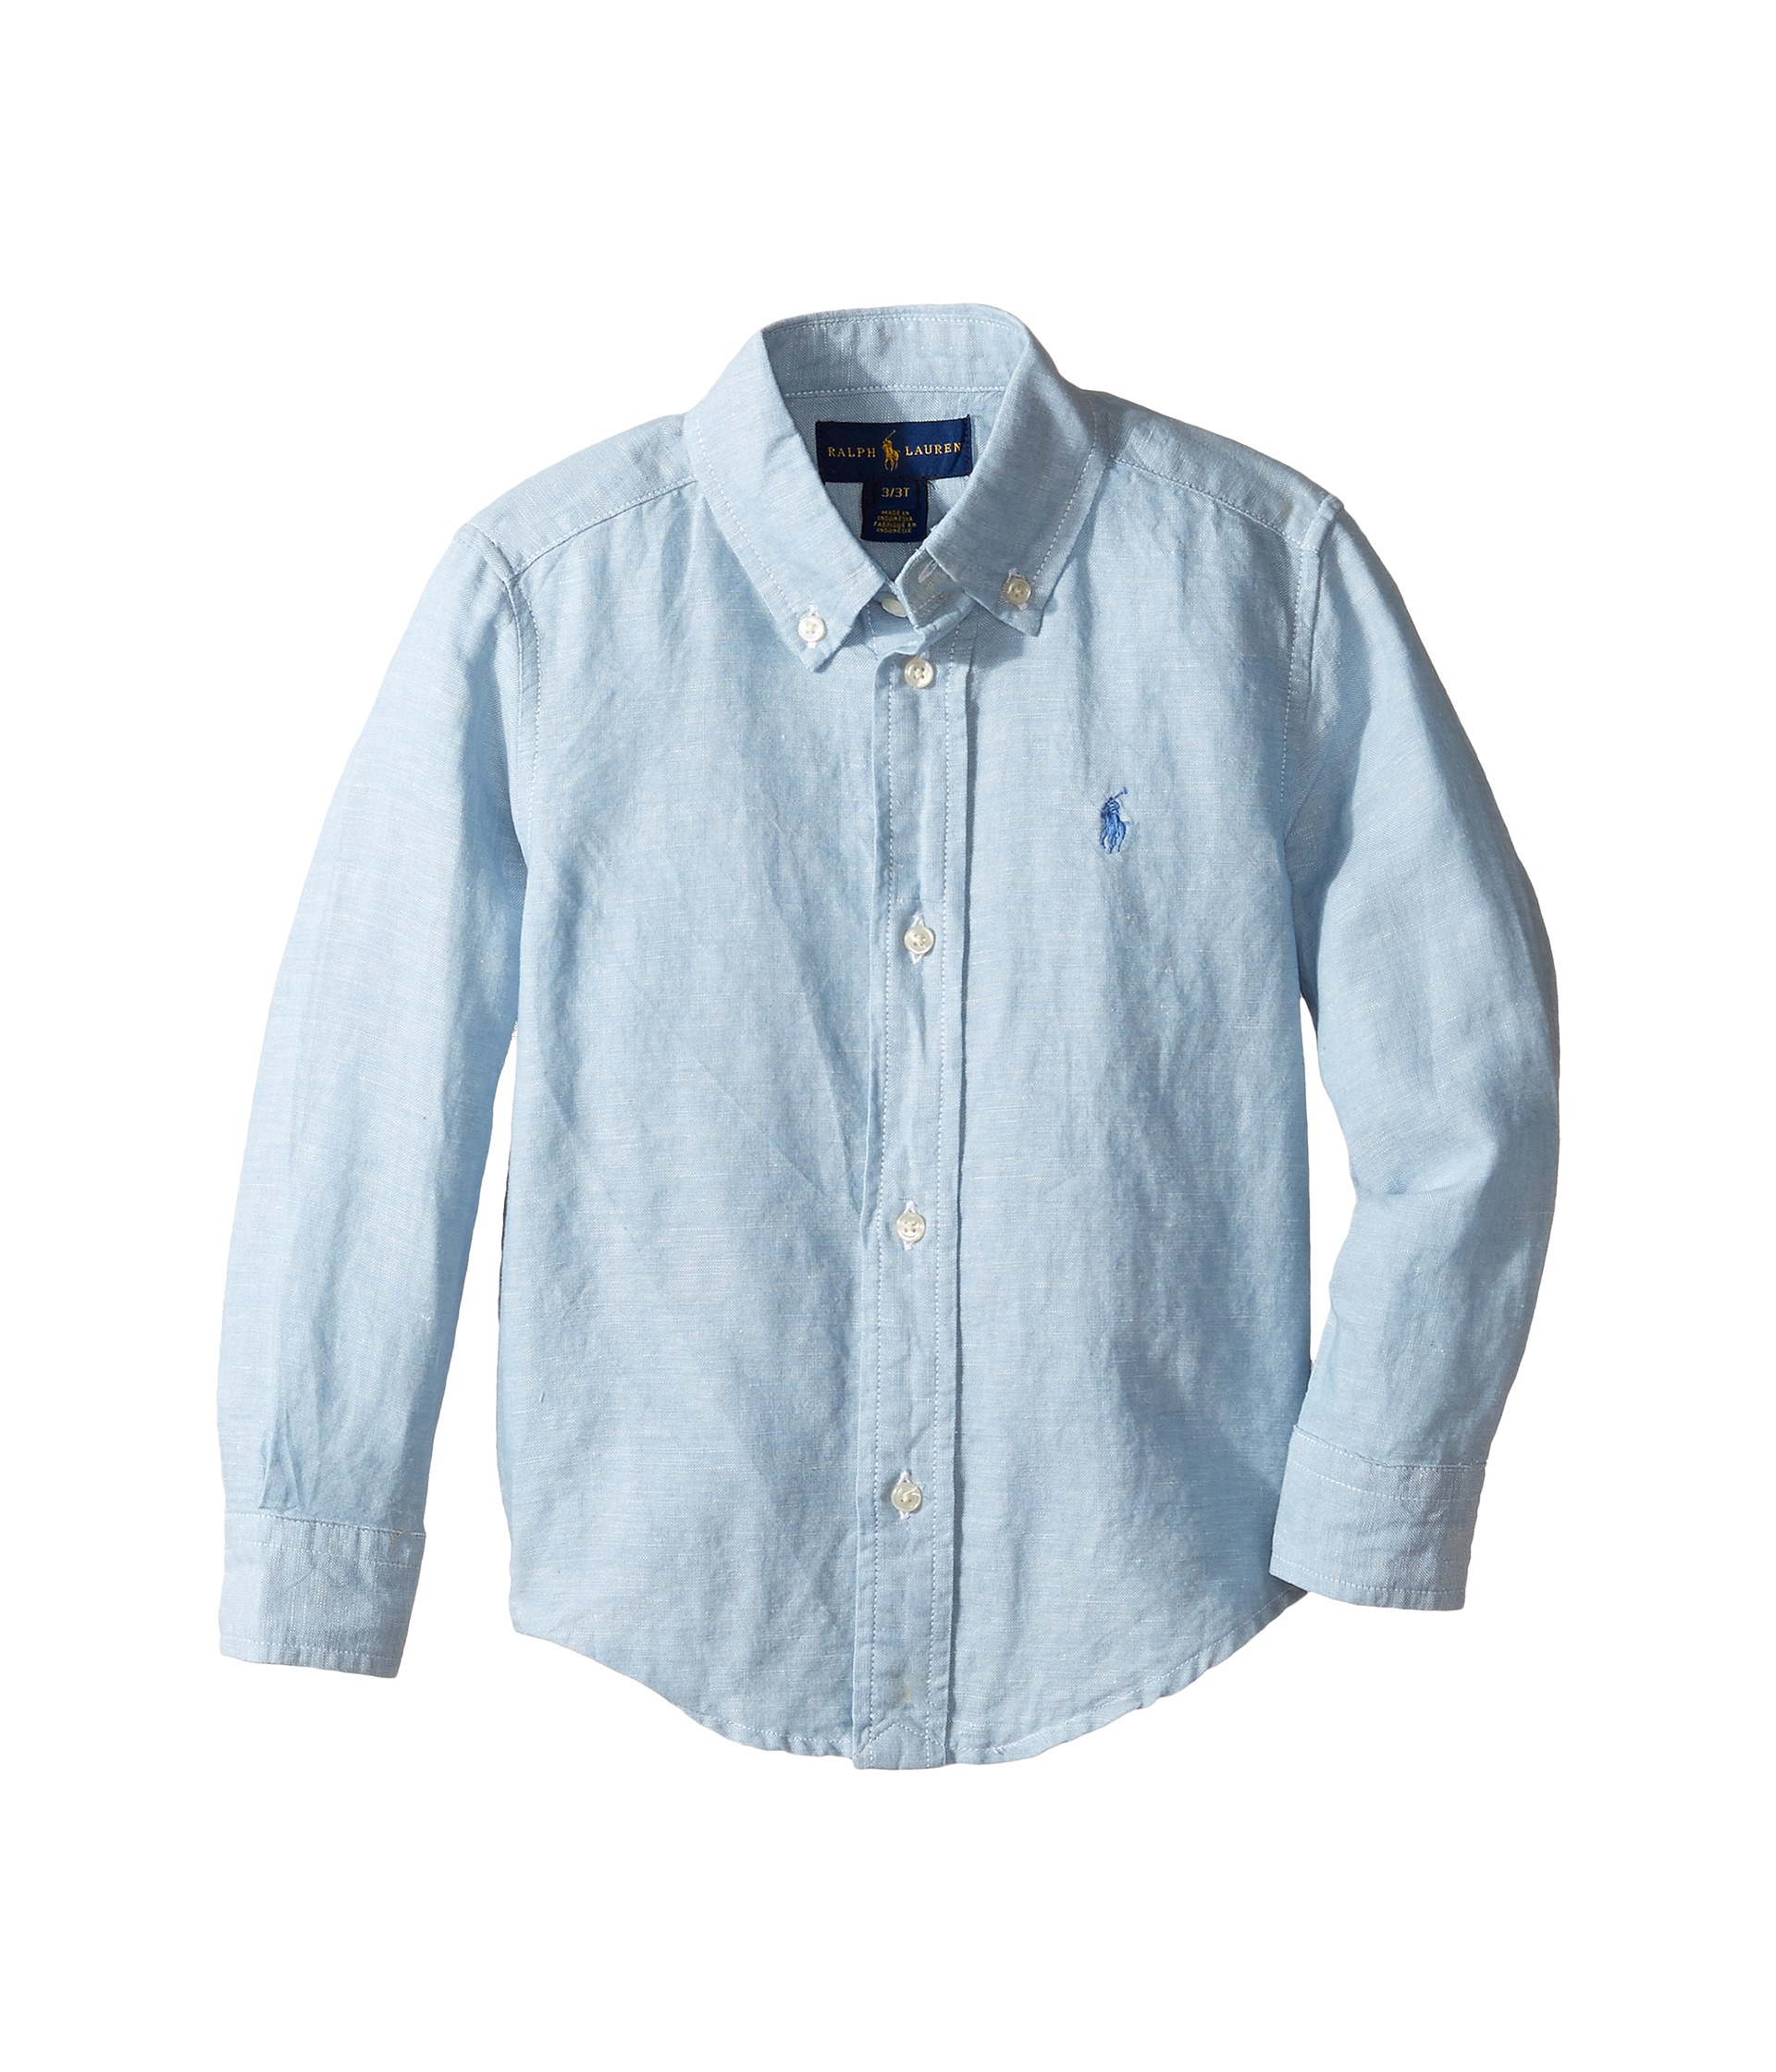 Polo ralph lauren kids linen chambray long sleeve button for Chambray shirt for kids